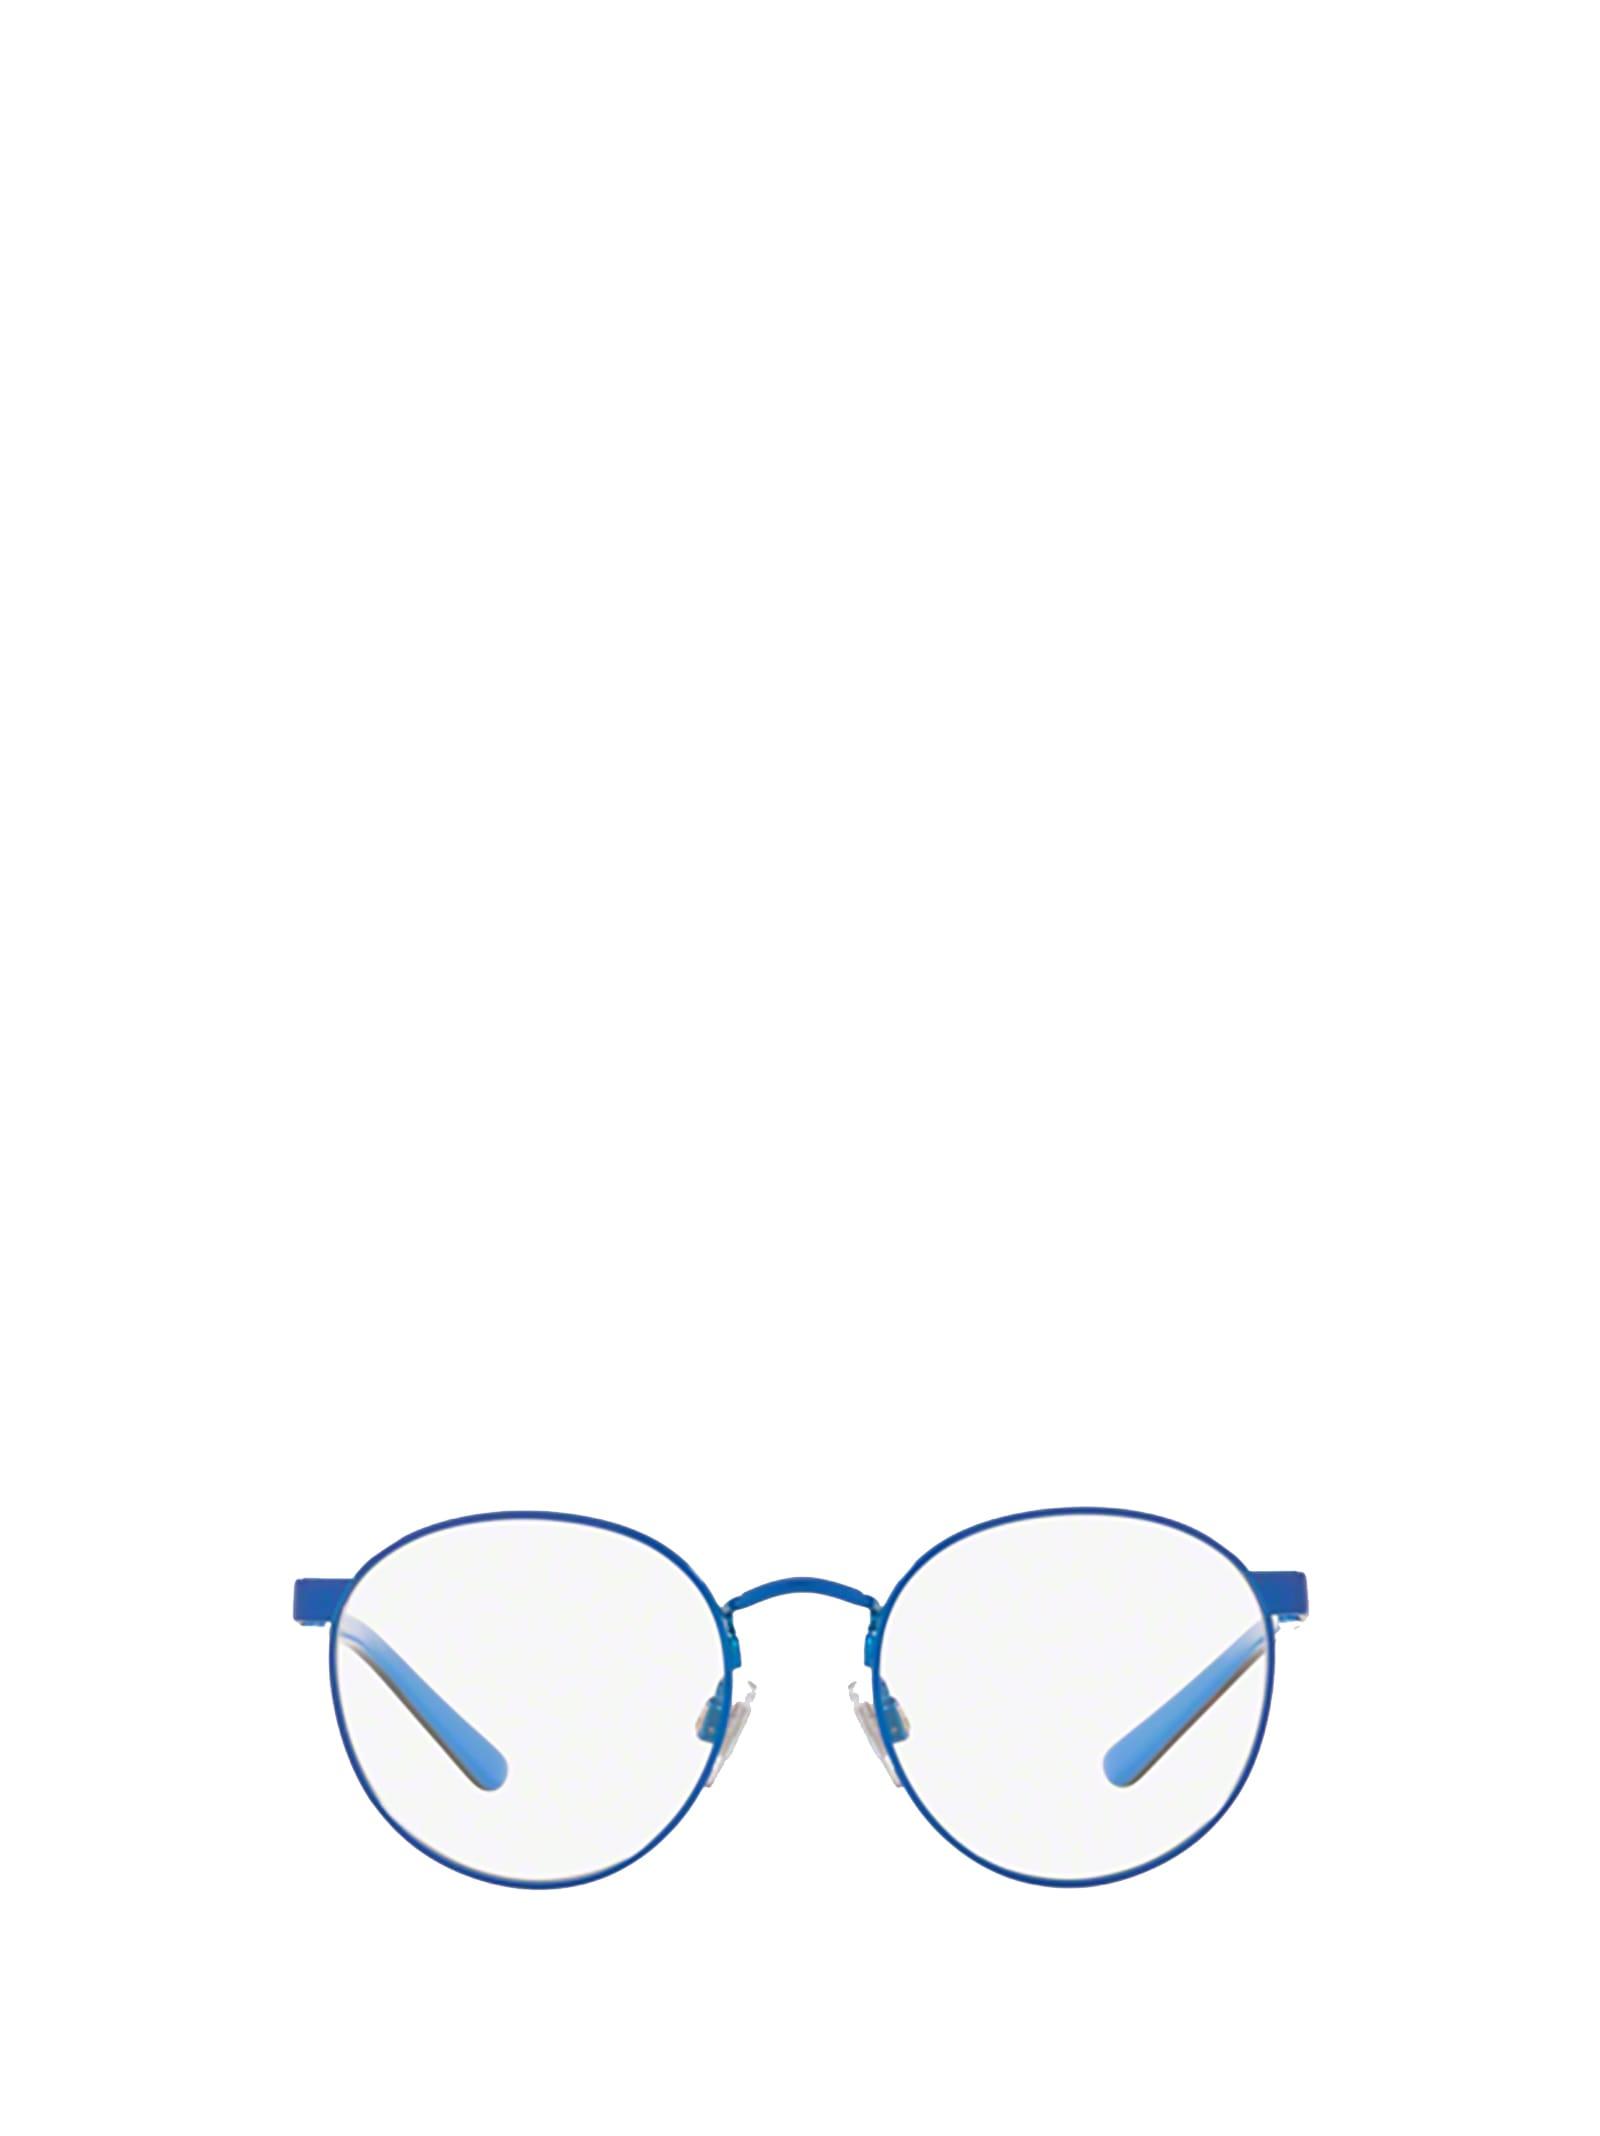 Polo Ralph Lauren Polo Ralph Lauren Pp8040 Blue Glasses